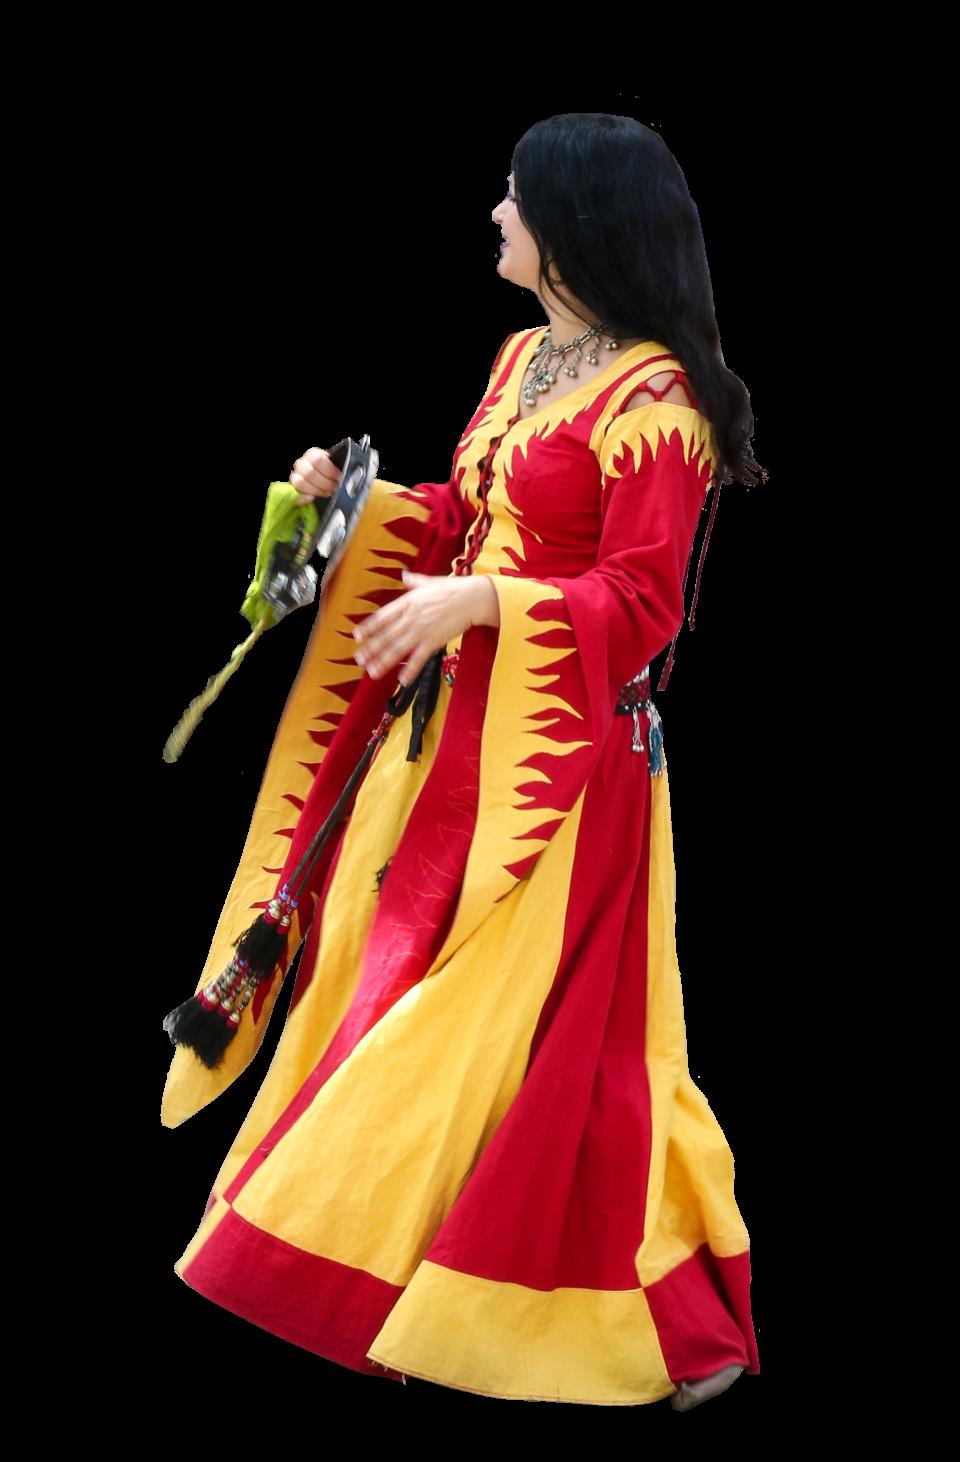 Woman PNG Image